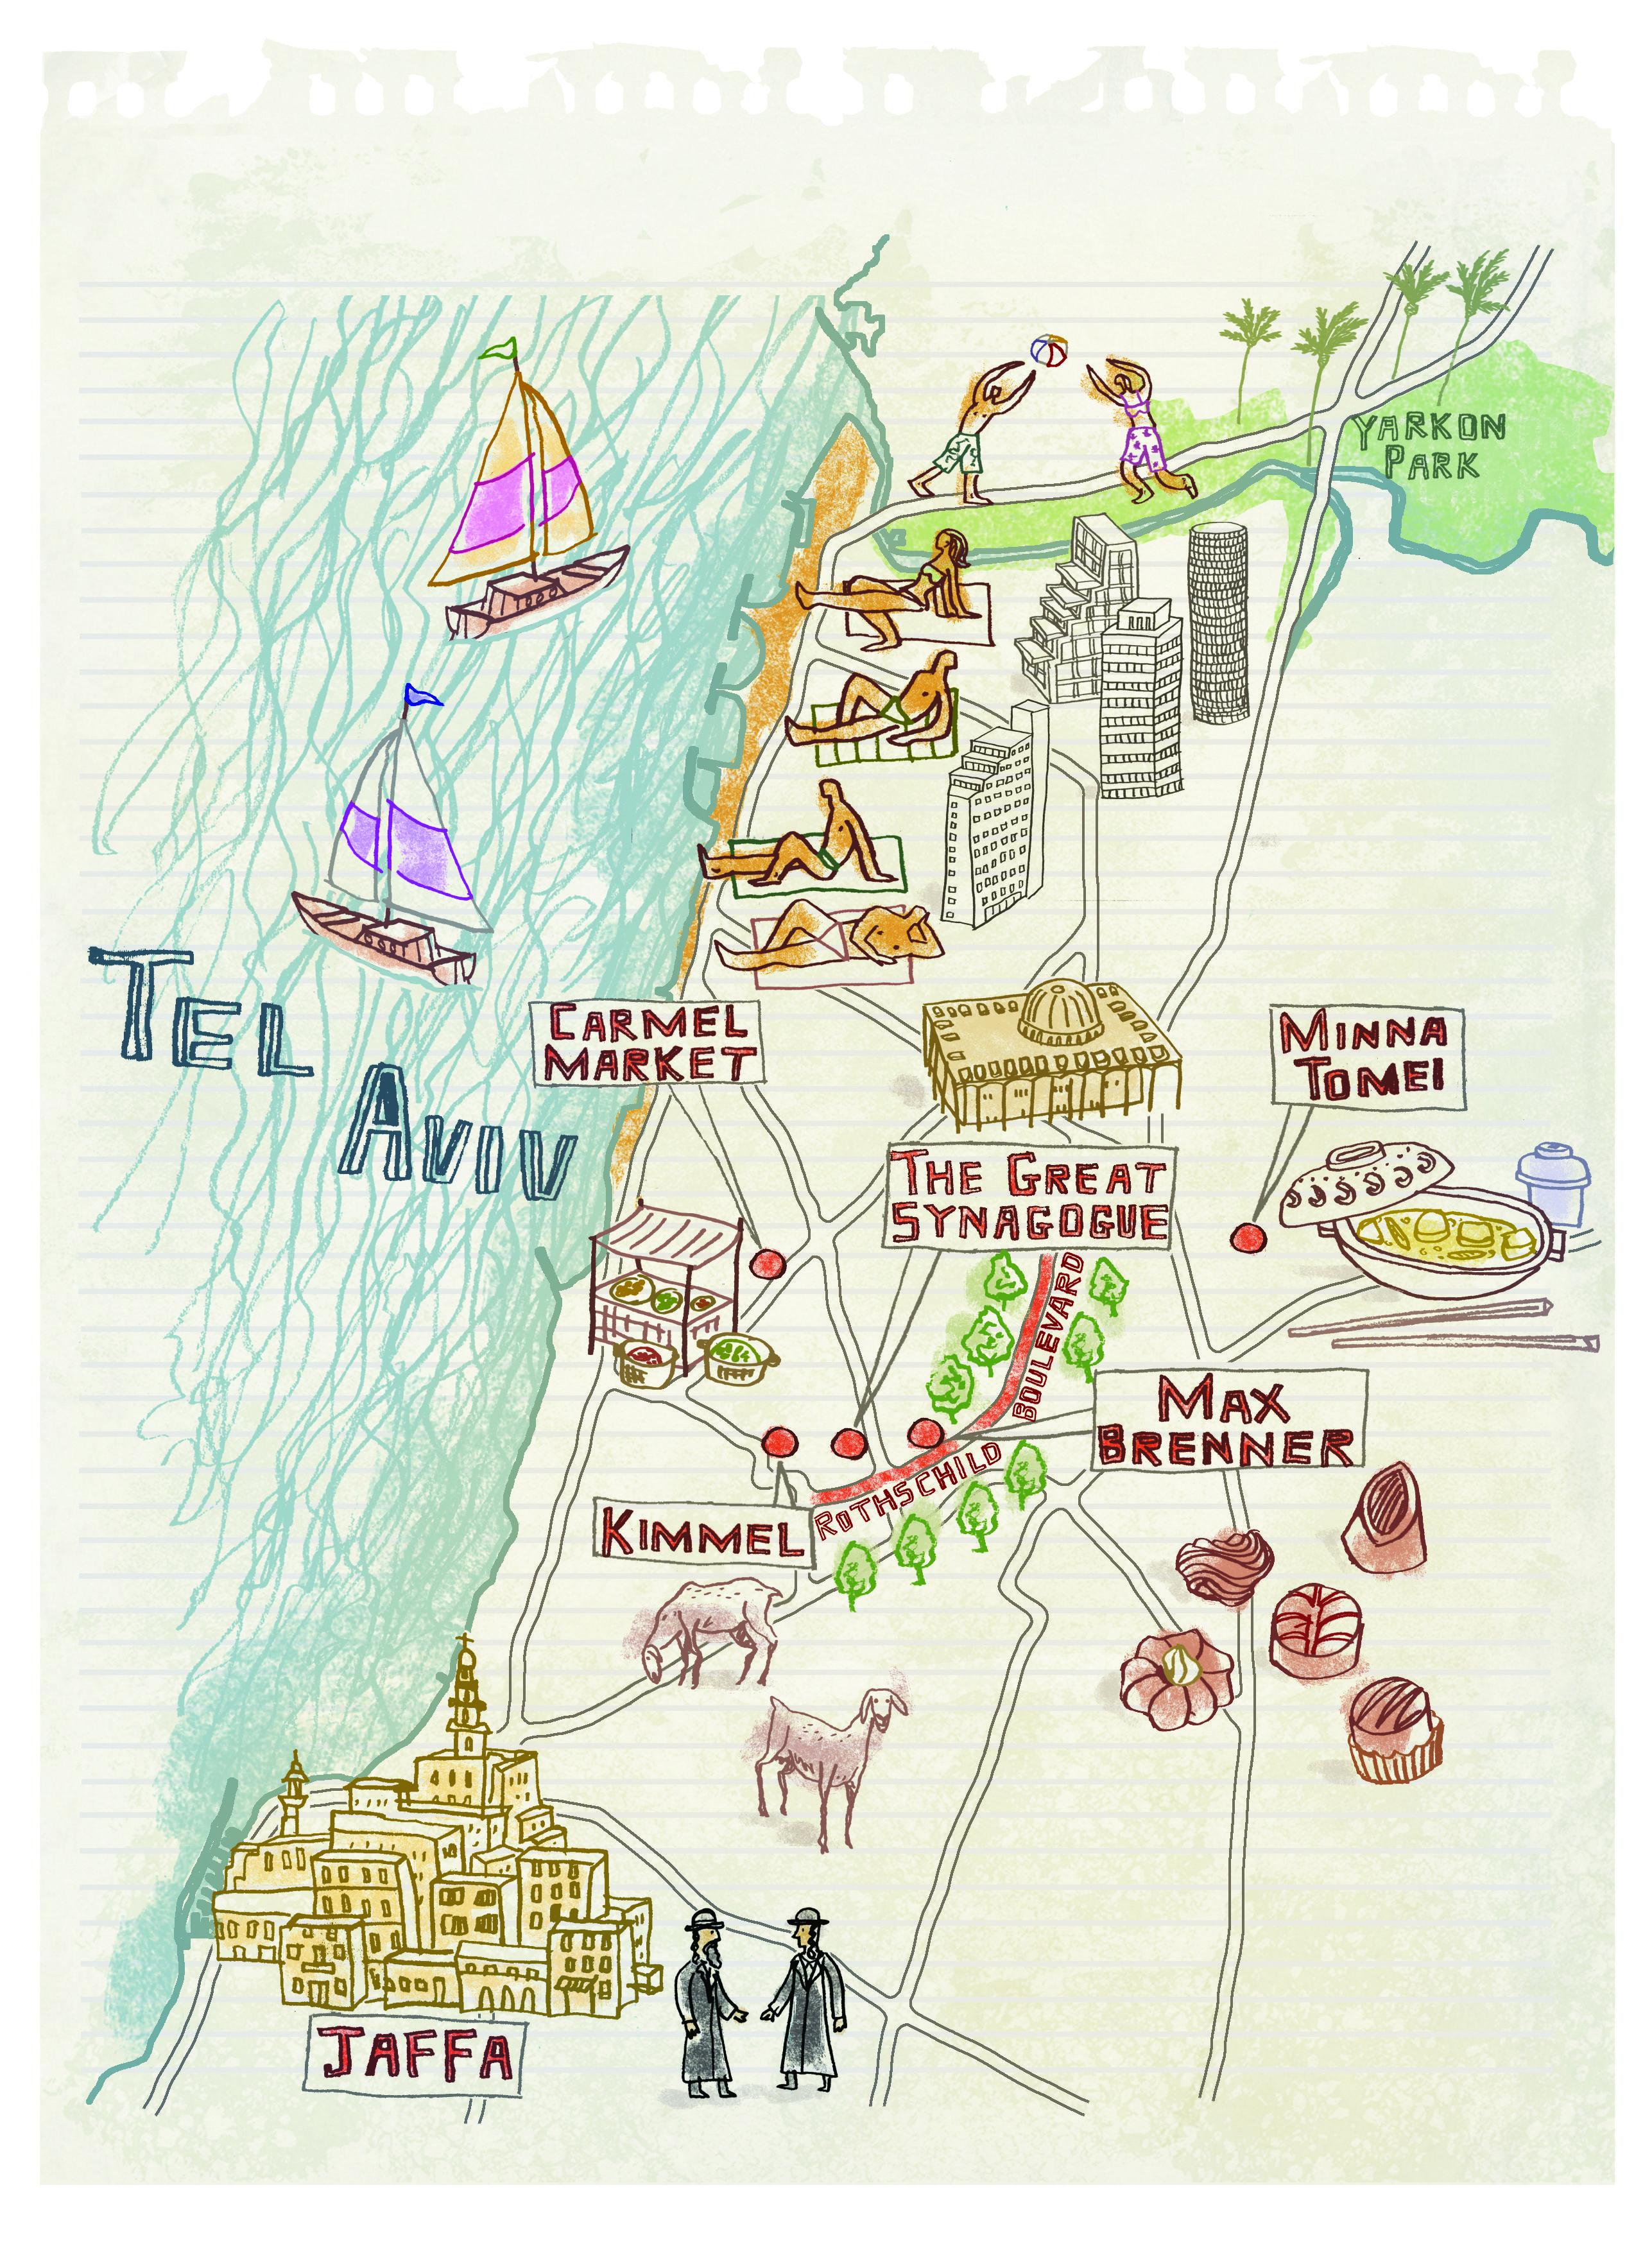 Tel Aviv Jerusalem Karte.Tel Aviv Map By Robert Littleford January 2016 Issue Israel In